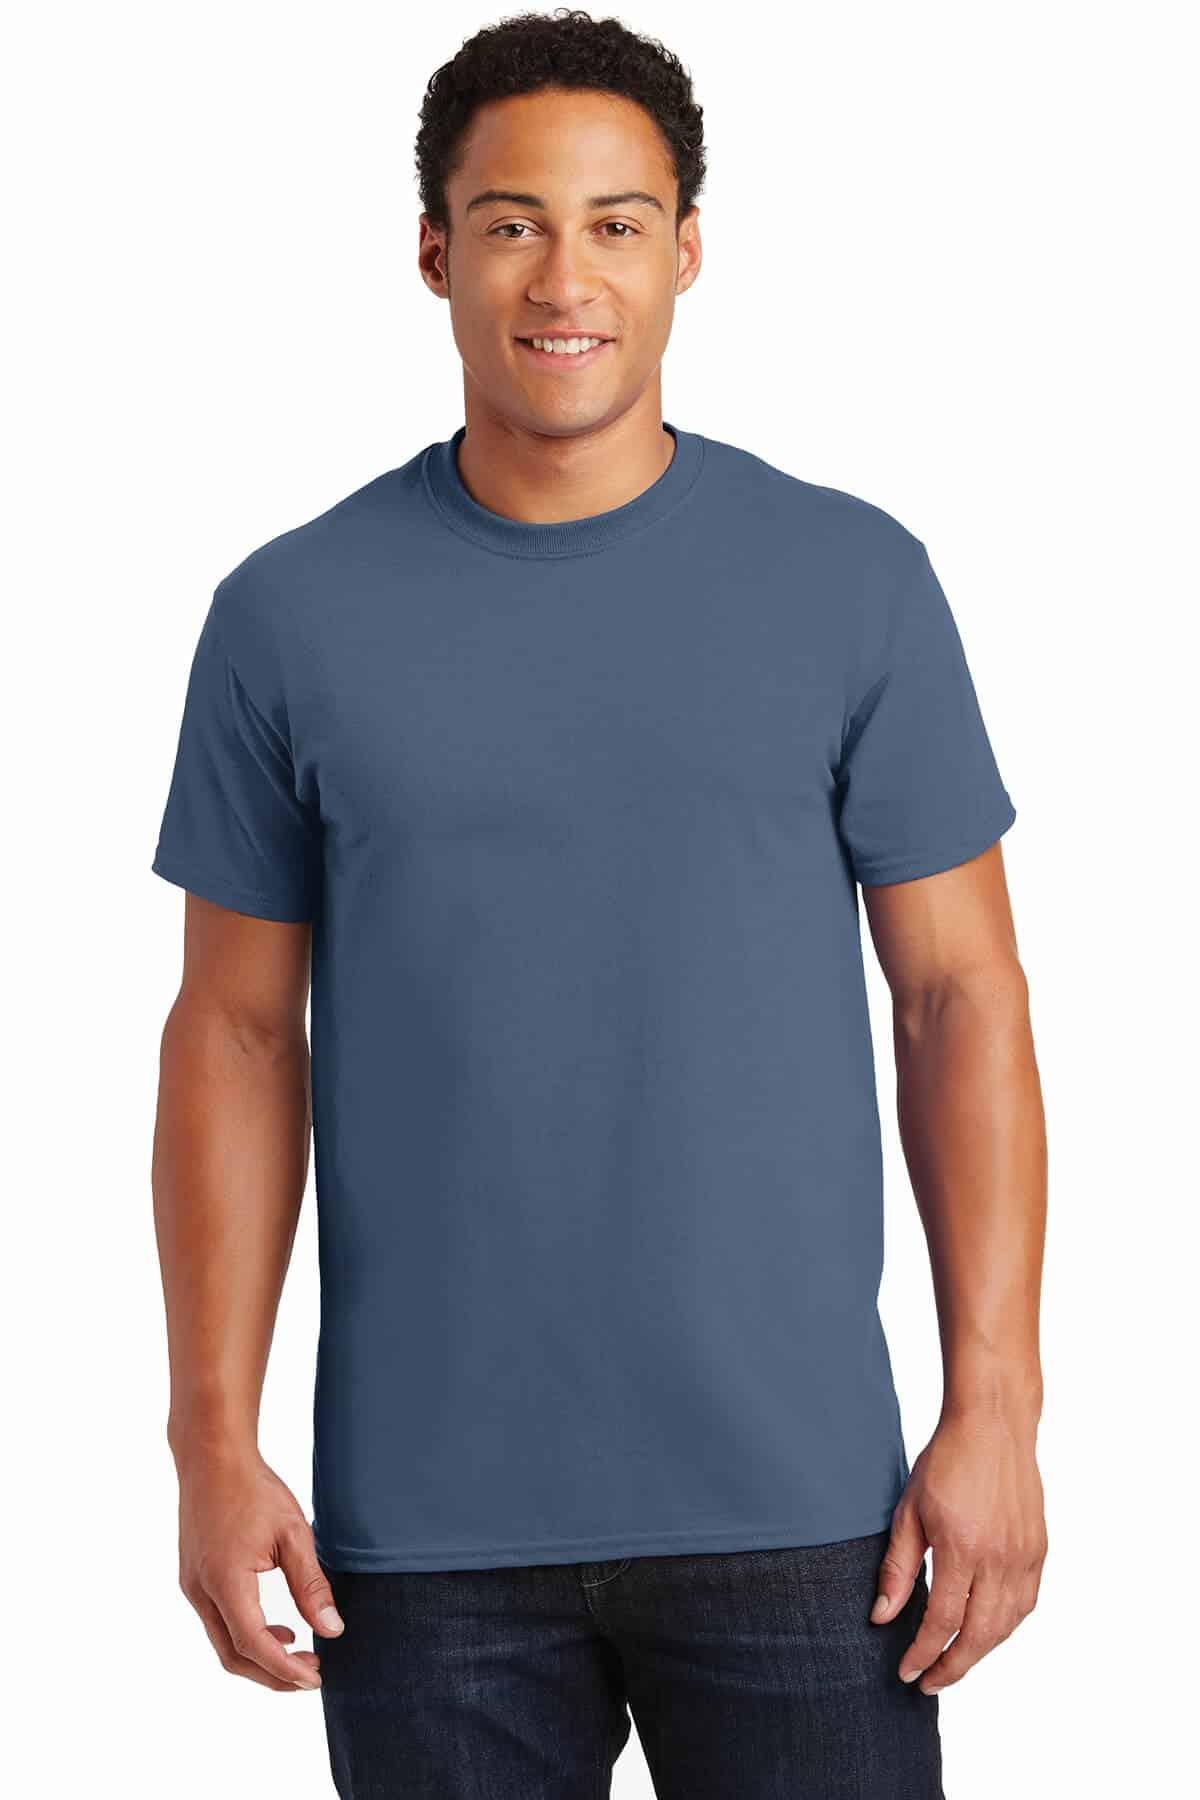 Indigo Blue TeeShirt Front